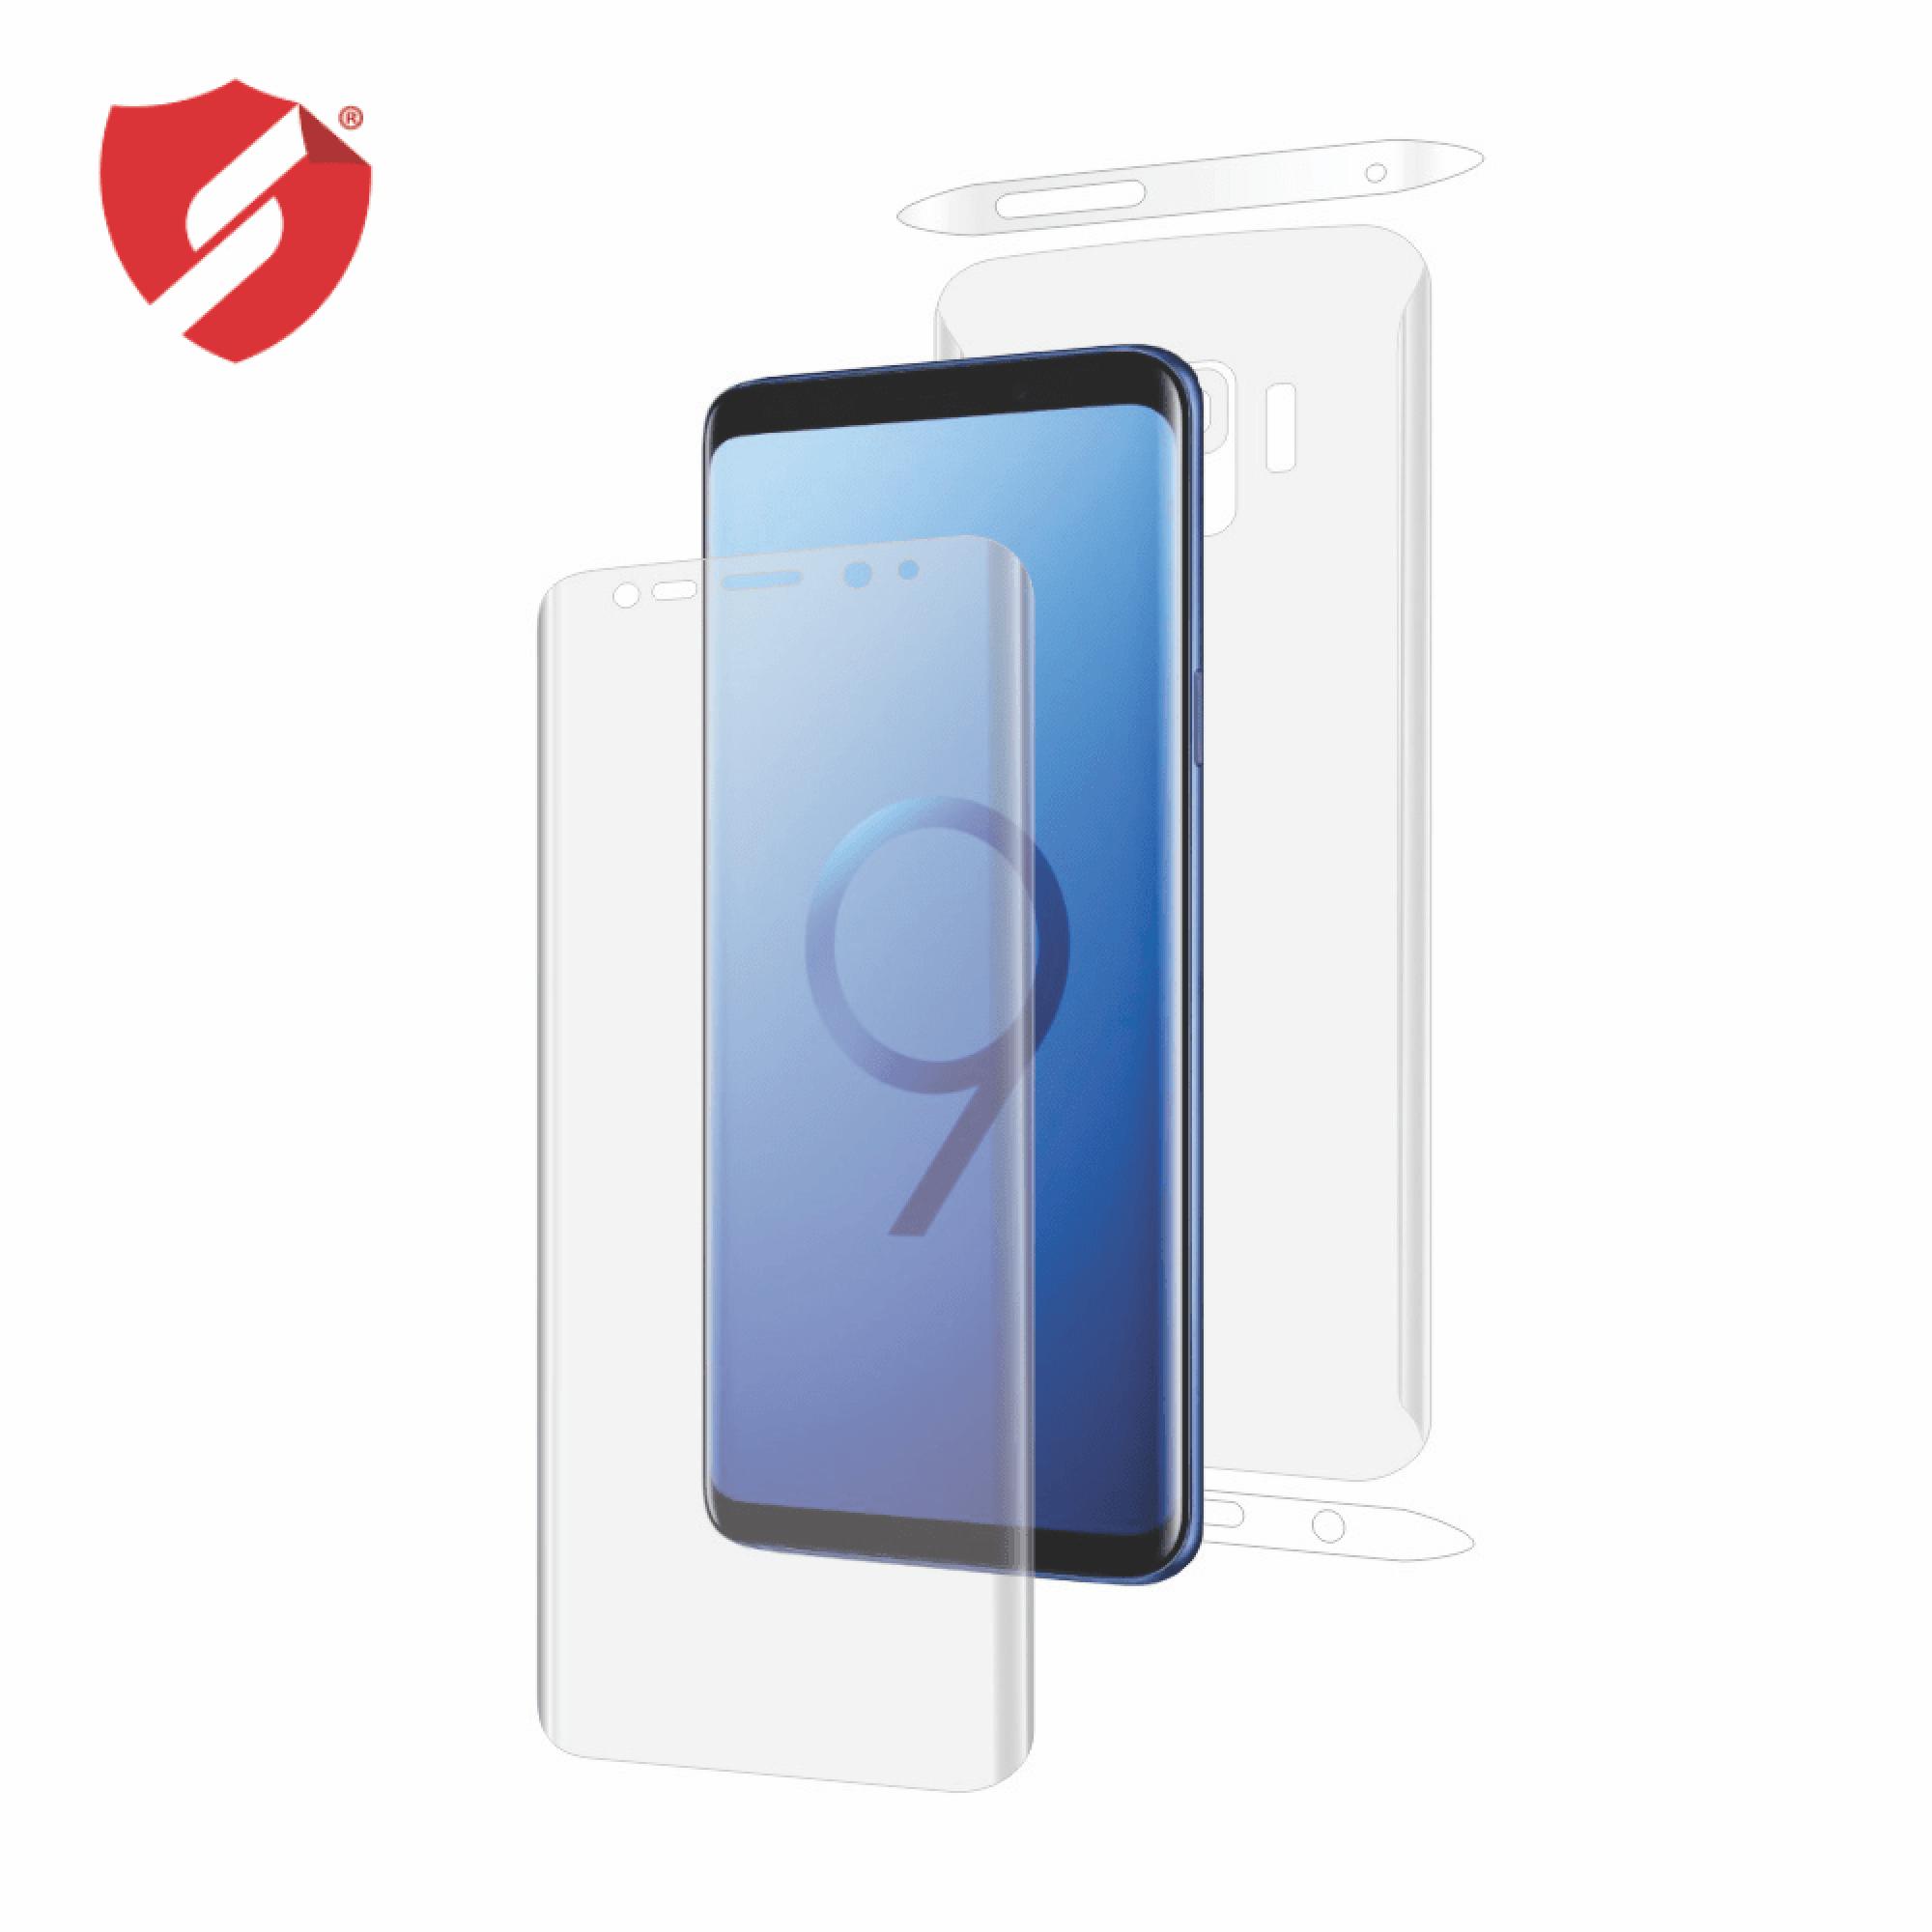 Folie de protectie Smart Protection Samsung Galaxy S9 compatibila cu carcasa Flip Cover - fullbody - display + spate + laterale imagine